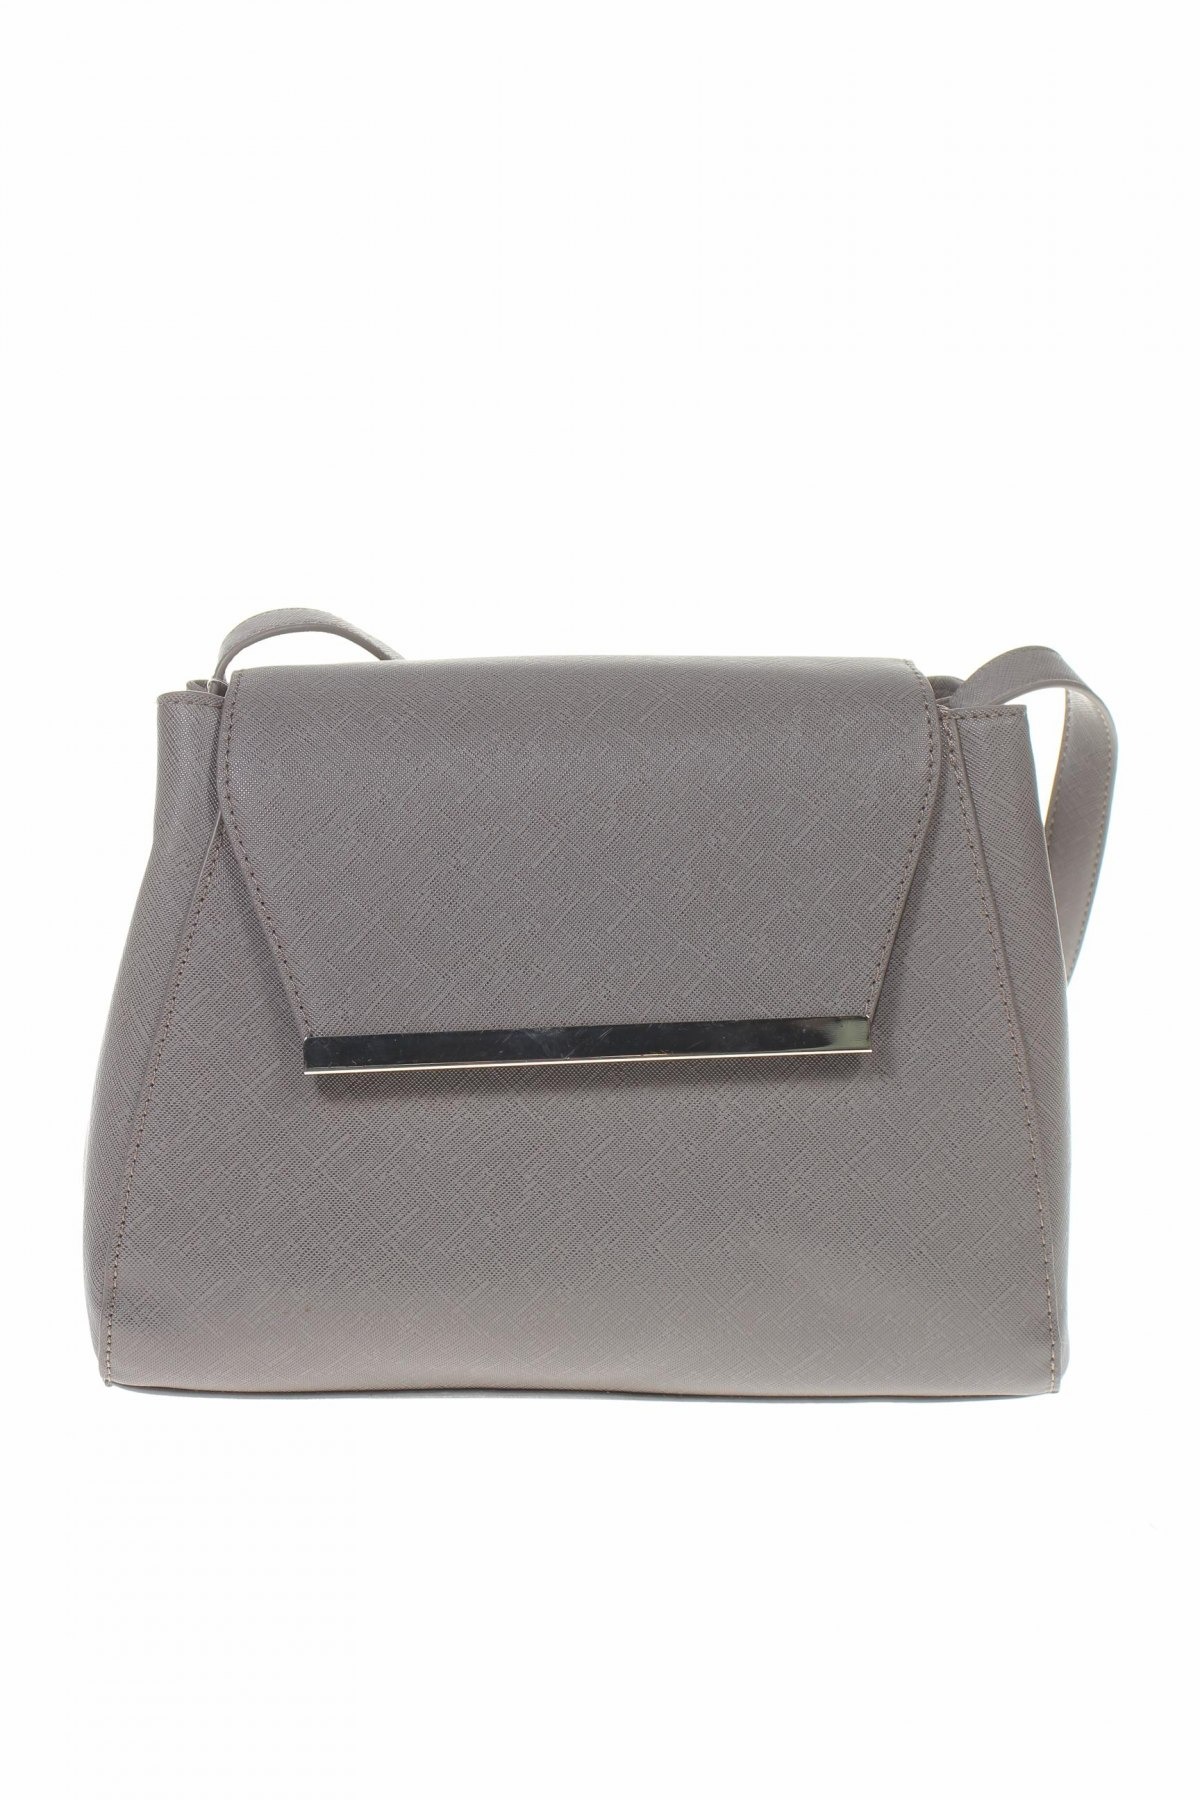 Дамска чанта Sinsay, Цвят Сив, Еко кожа, Цена 24,50лв.